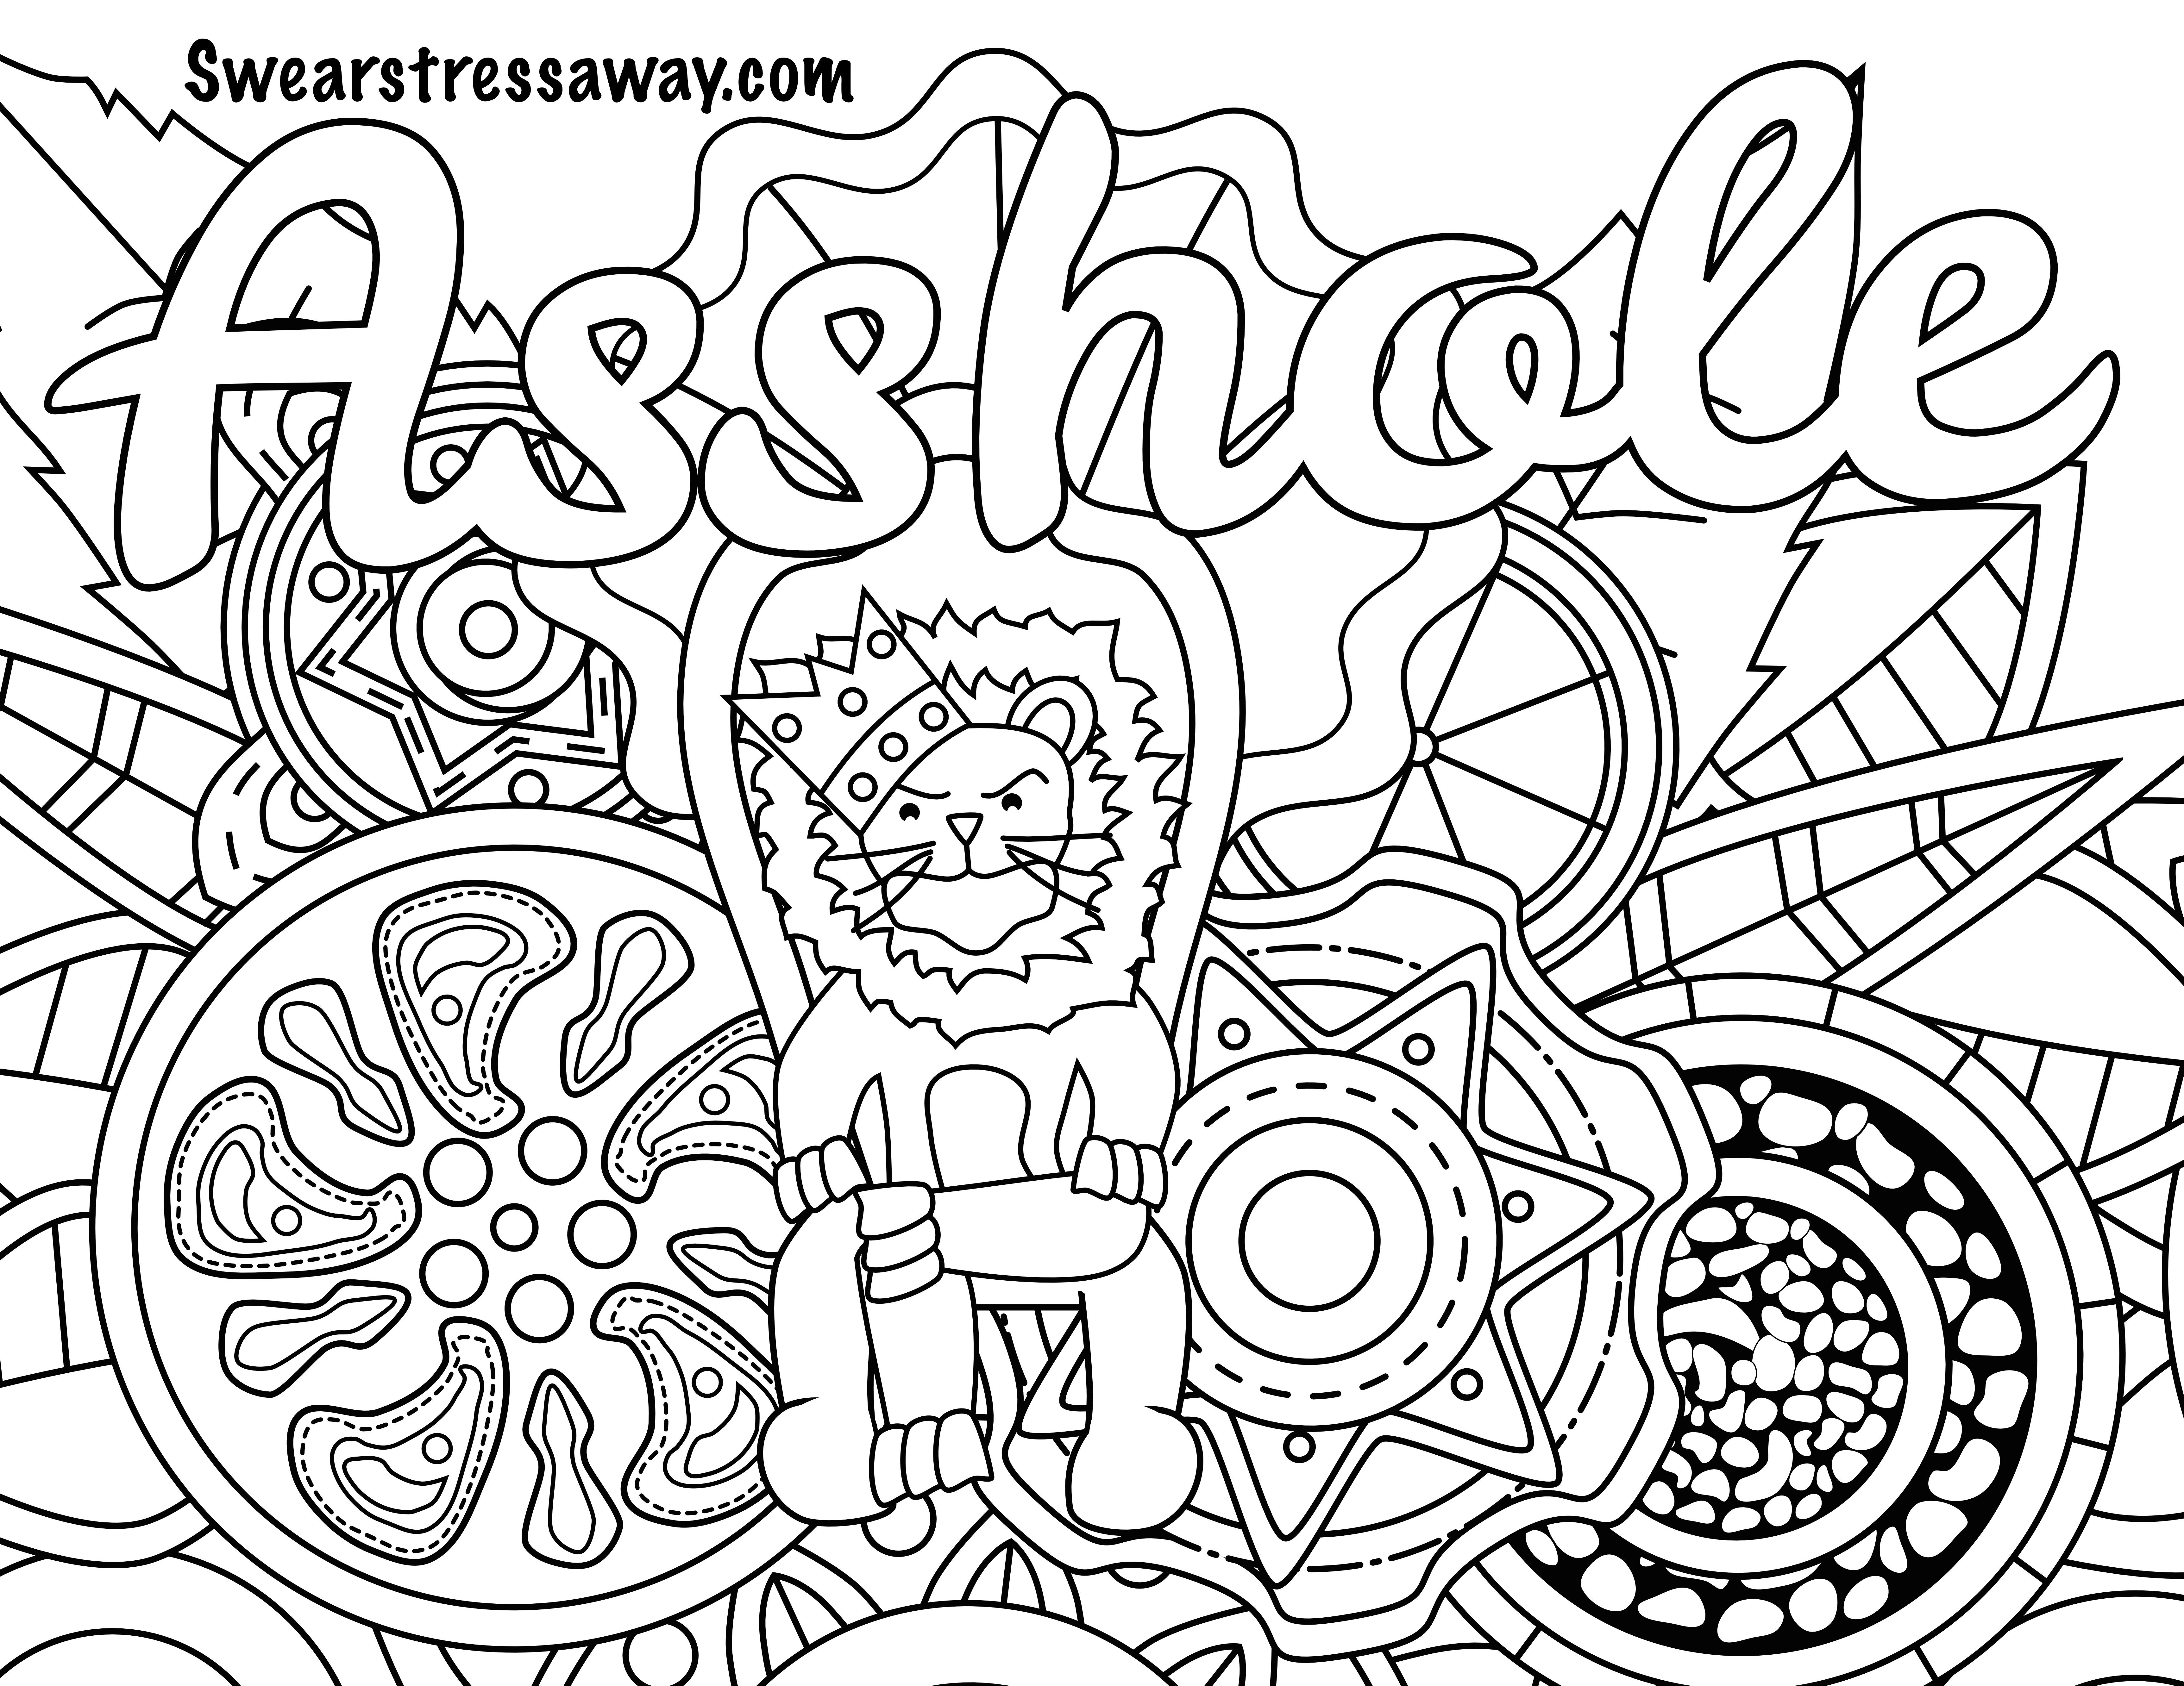 Swaer Words Coloring Page